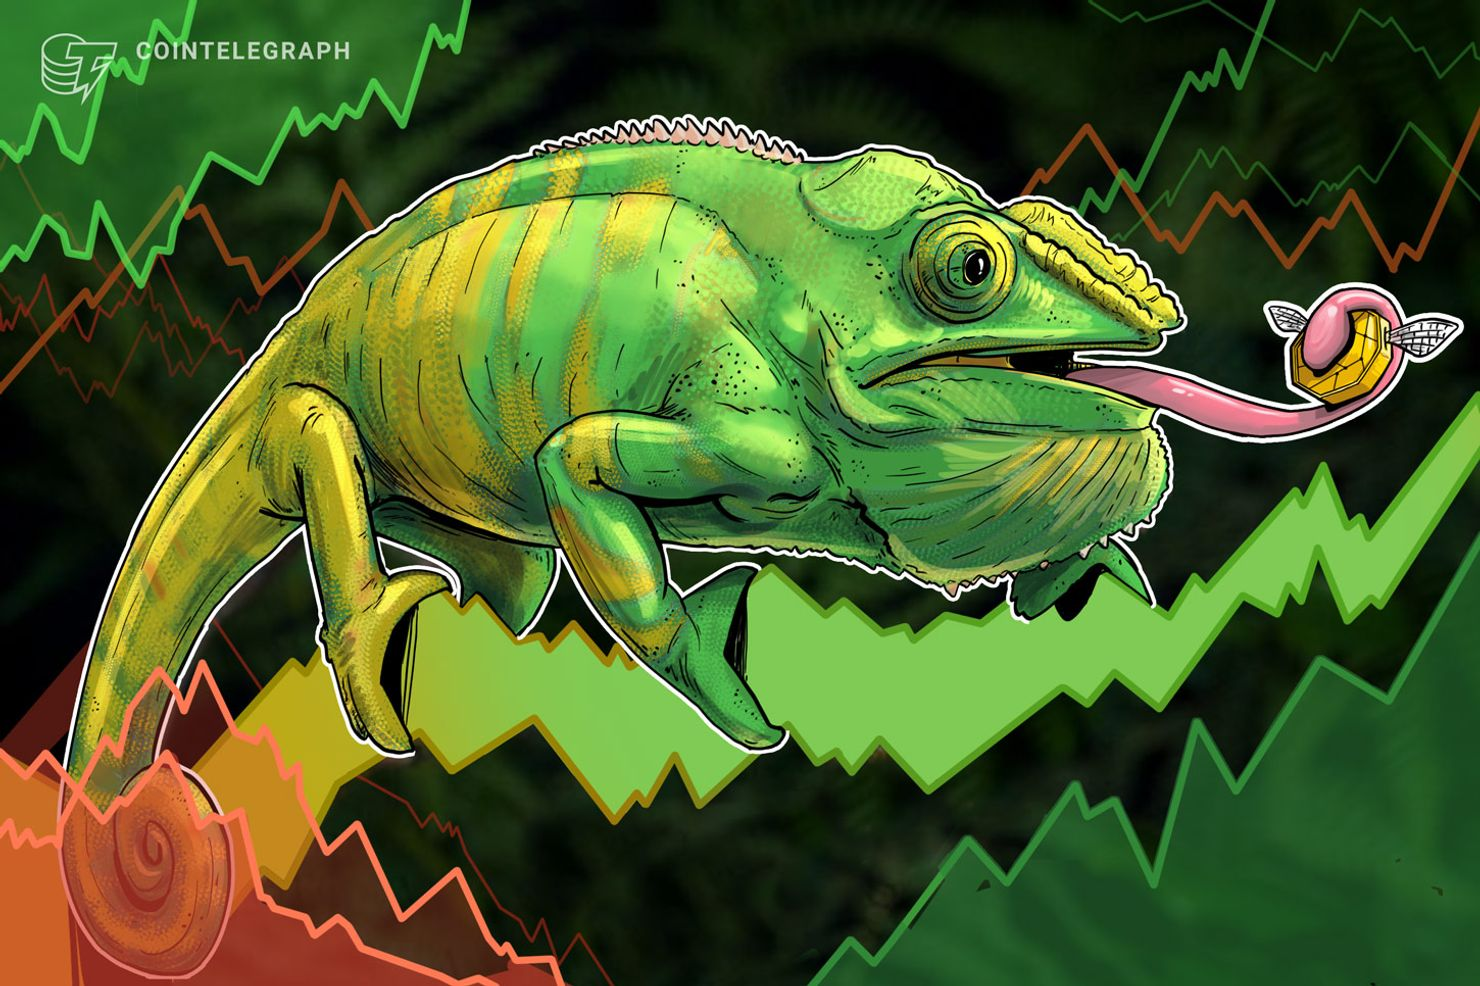 Crypto Markets See Slight Rebound, Bitcoin Trades Above $6,500 Again